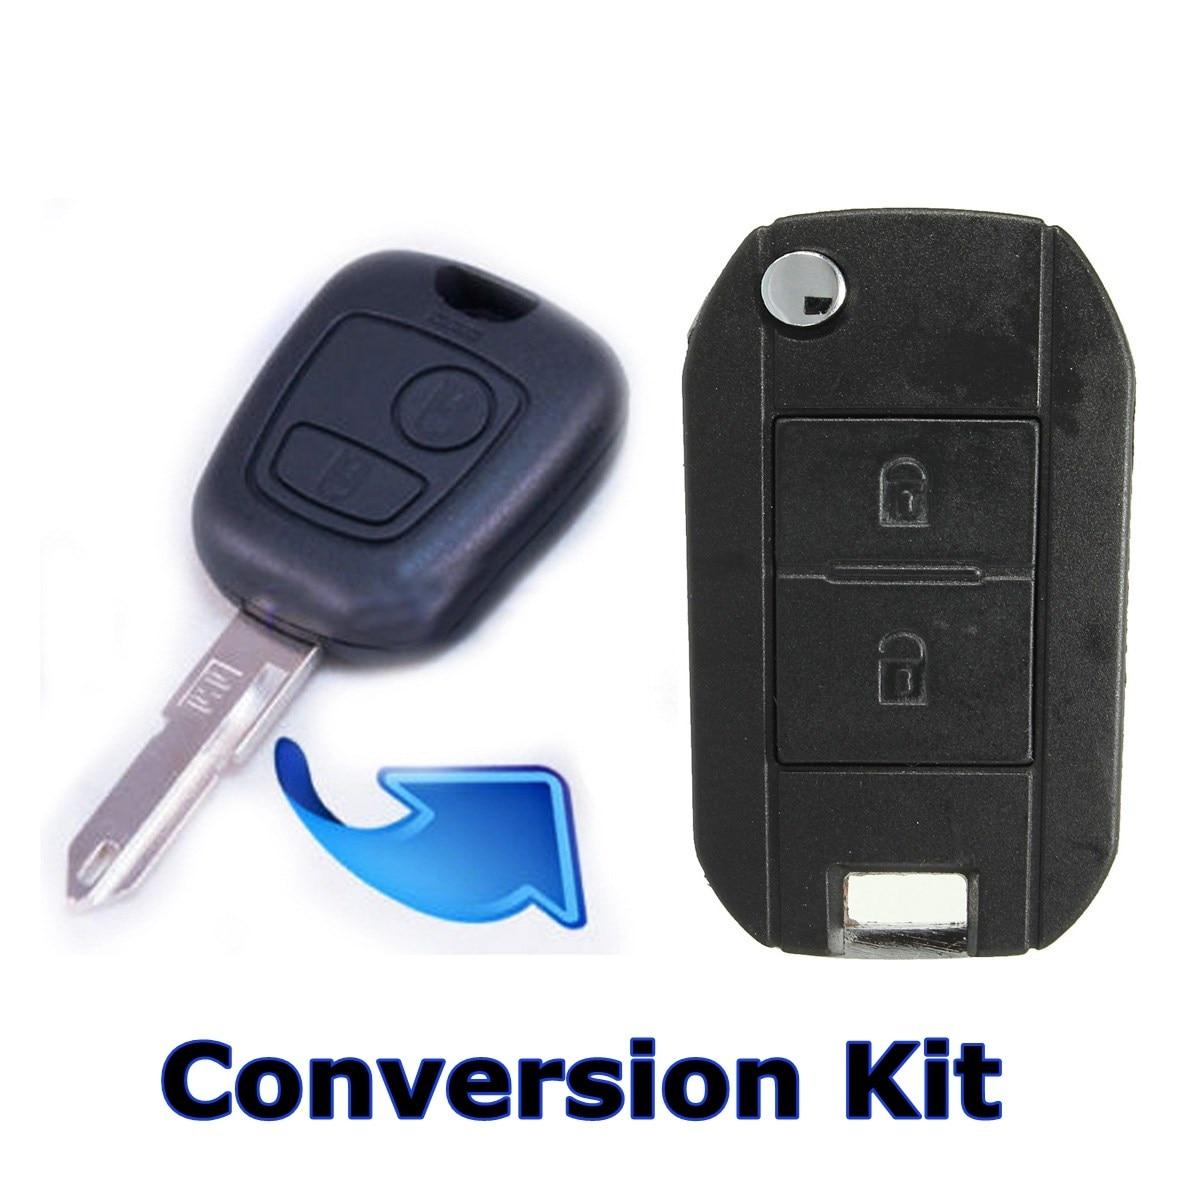 2 taste Fernbedienung Folding Key Fob Fall Konvertieren Für Peugeot 407 107 307 406 C2 C3 C4